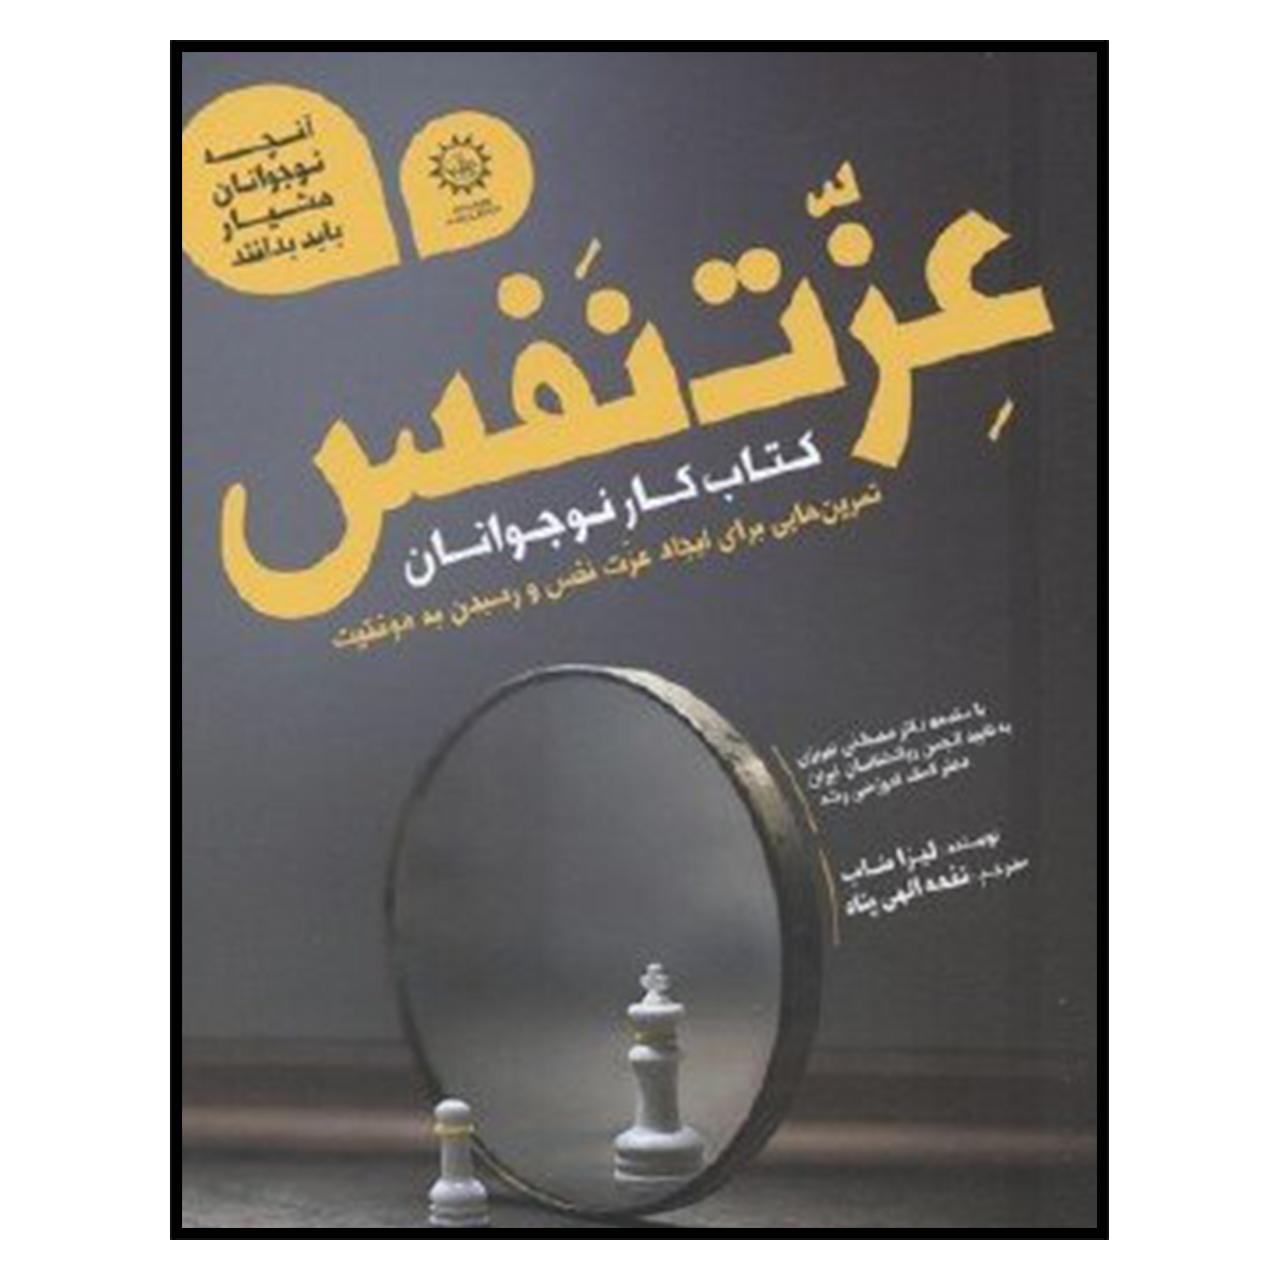 کتاب عزت نفس كتاب كار نوجوانان اثر ليزا شاب نشر ايران بان